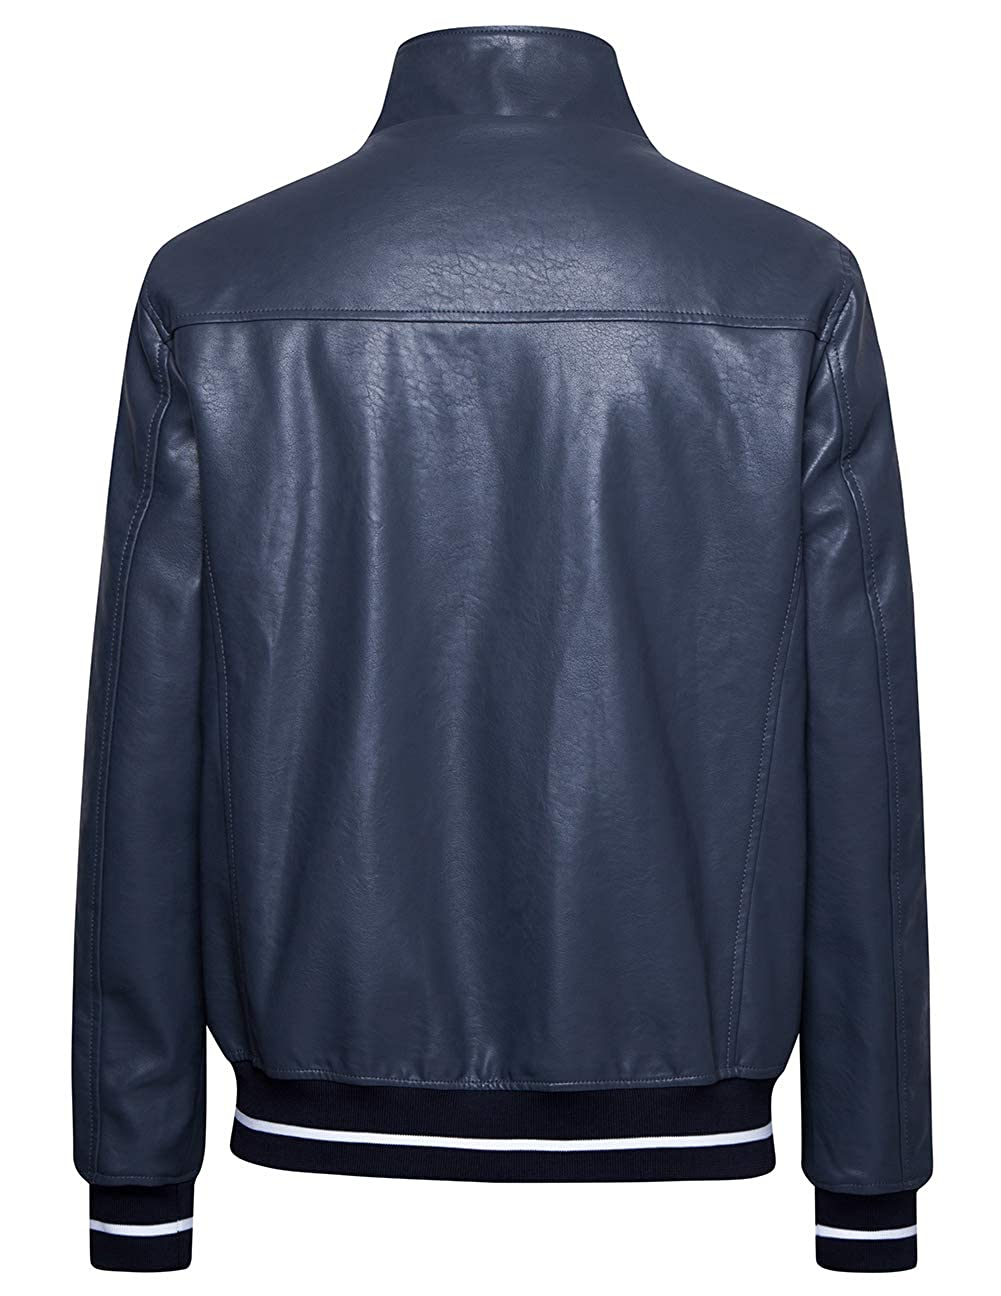 blackmogoo Mens Faux Leather Jacket Outerwear Windbreaker and Waterproof Hooded Jacket